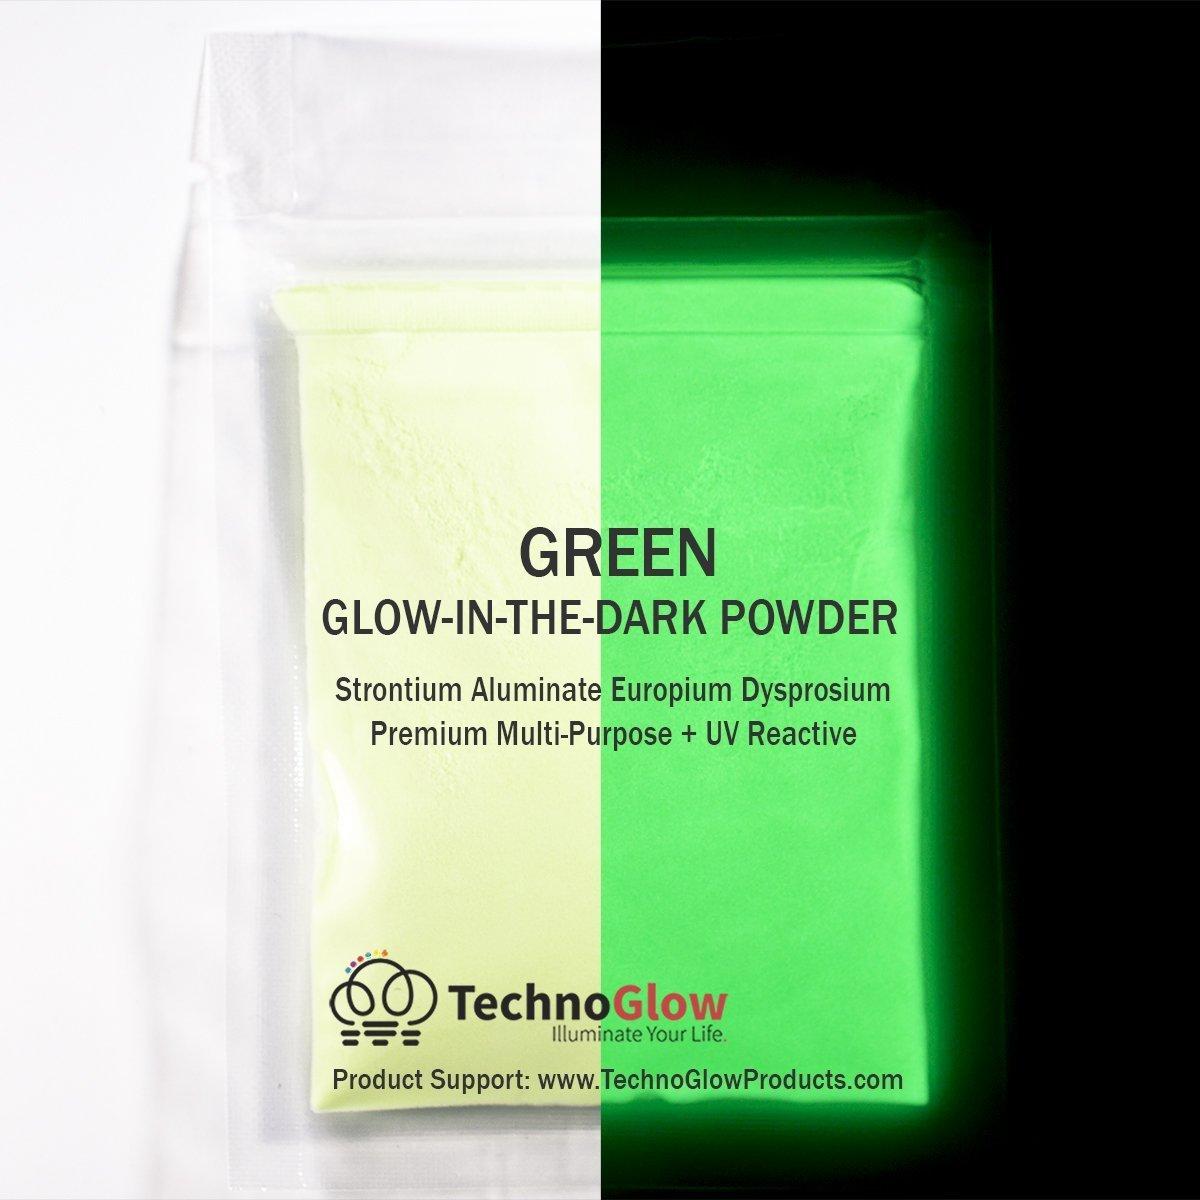 Green Glow in the Dark & UV Powder - Waterproof 45-60 Microns (8 OZ) by Techno Glow Inc